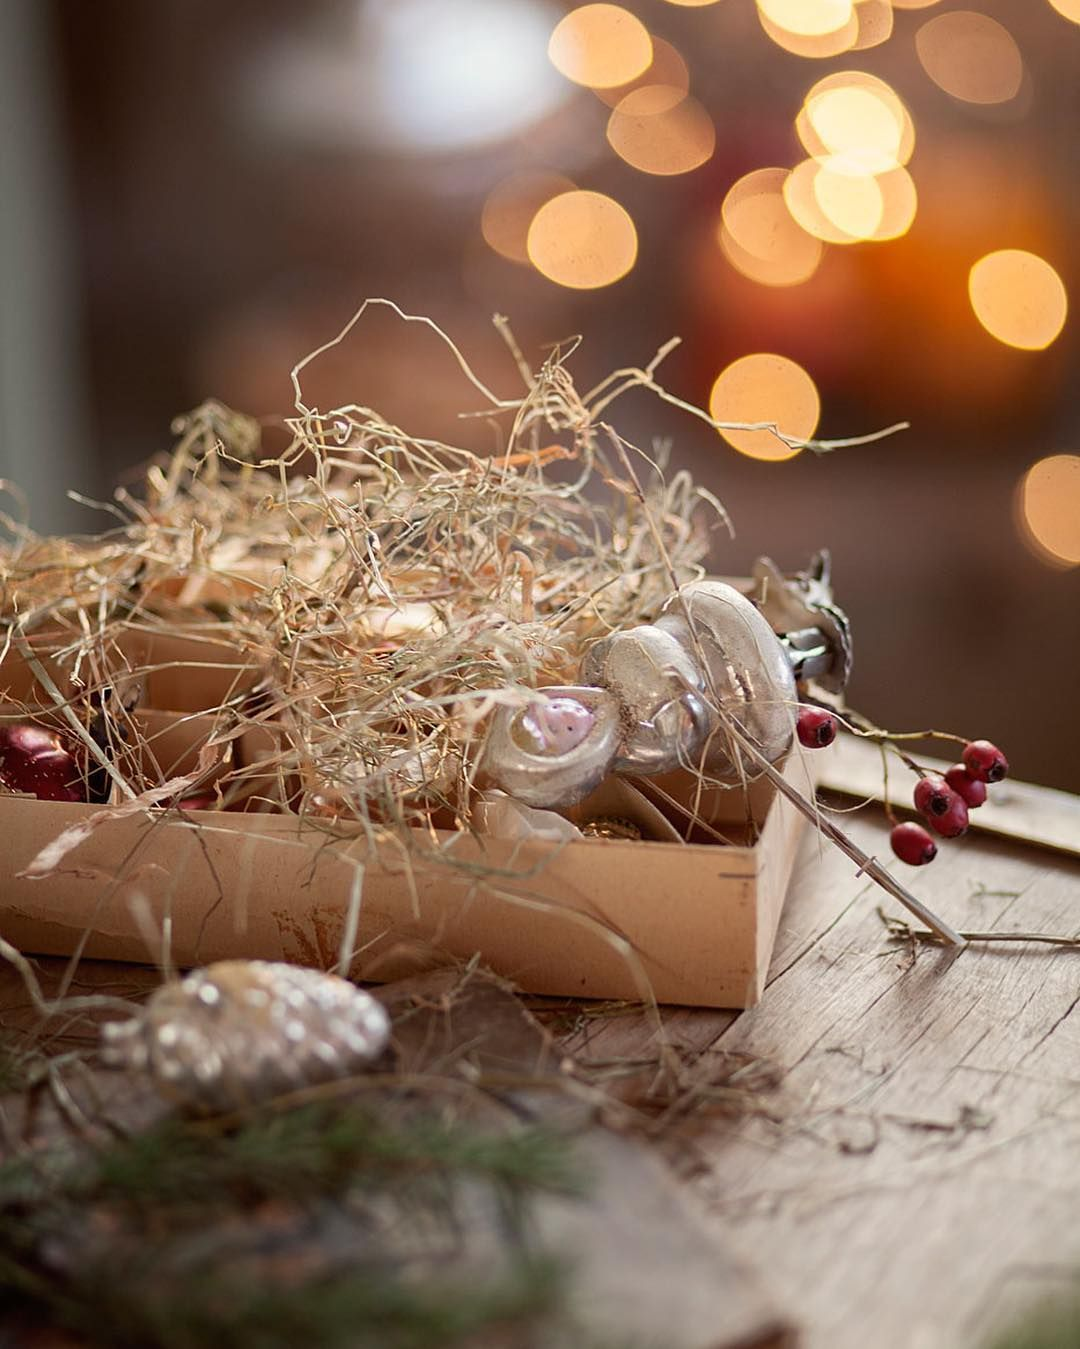 #allthebeautifulthings #christmas #oldchristmastreetoys #sovietchristmastoys #christmasiscoming #kalėdos